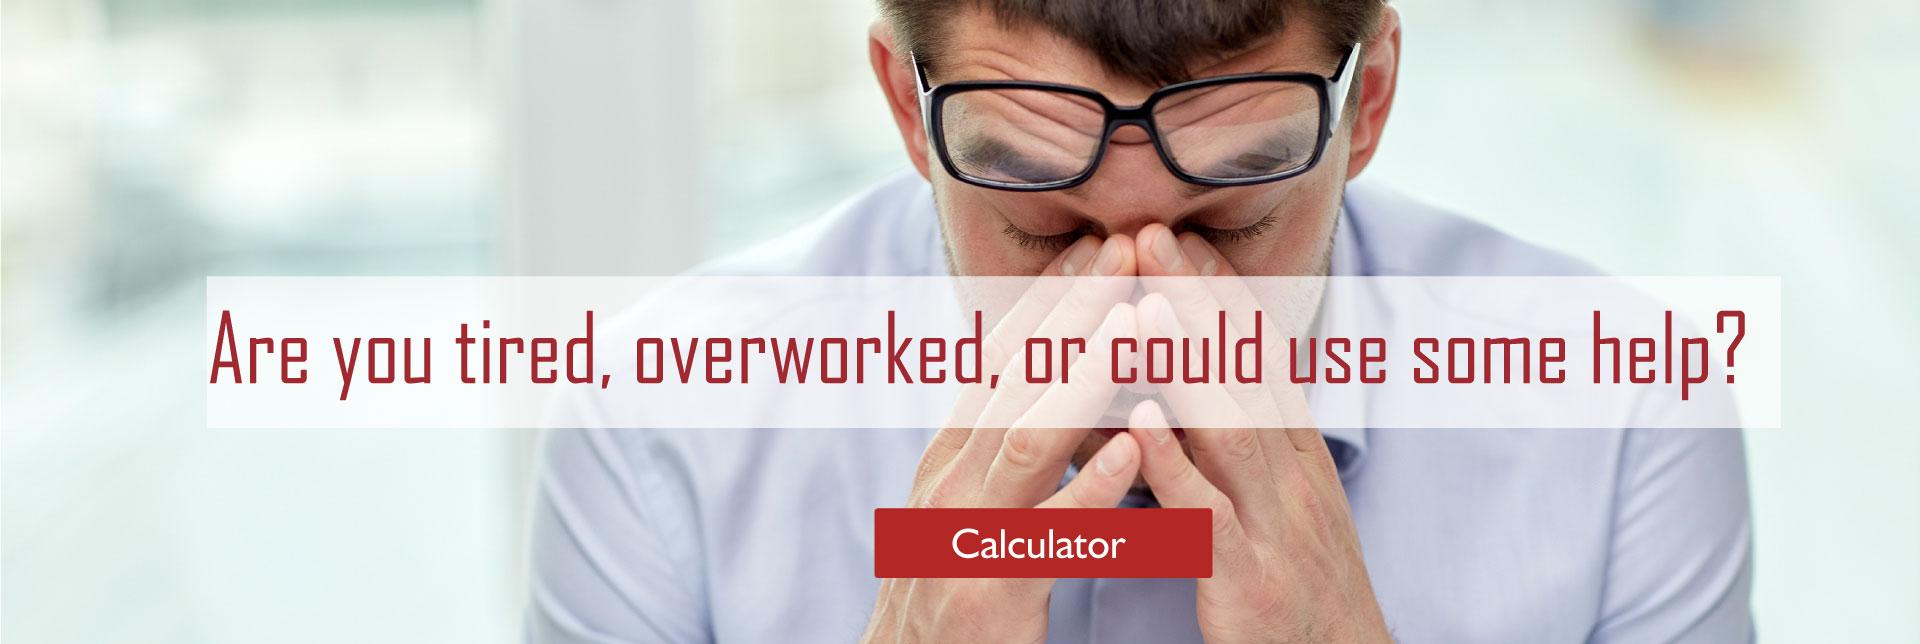 VIRTUALEMILY-Calculator.jpg